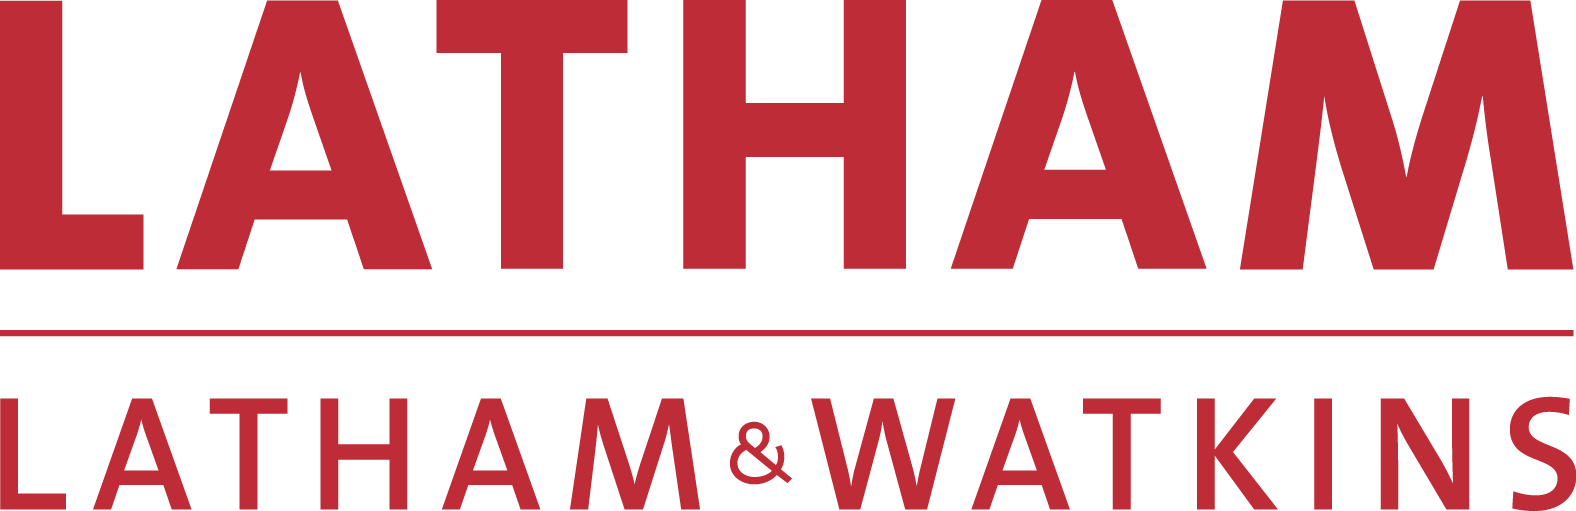 LW_Sponsorships.png